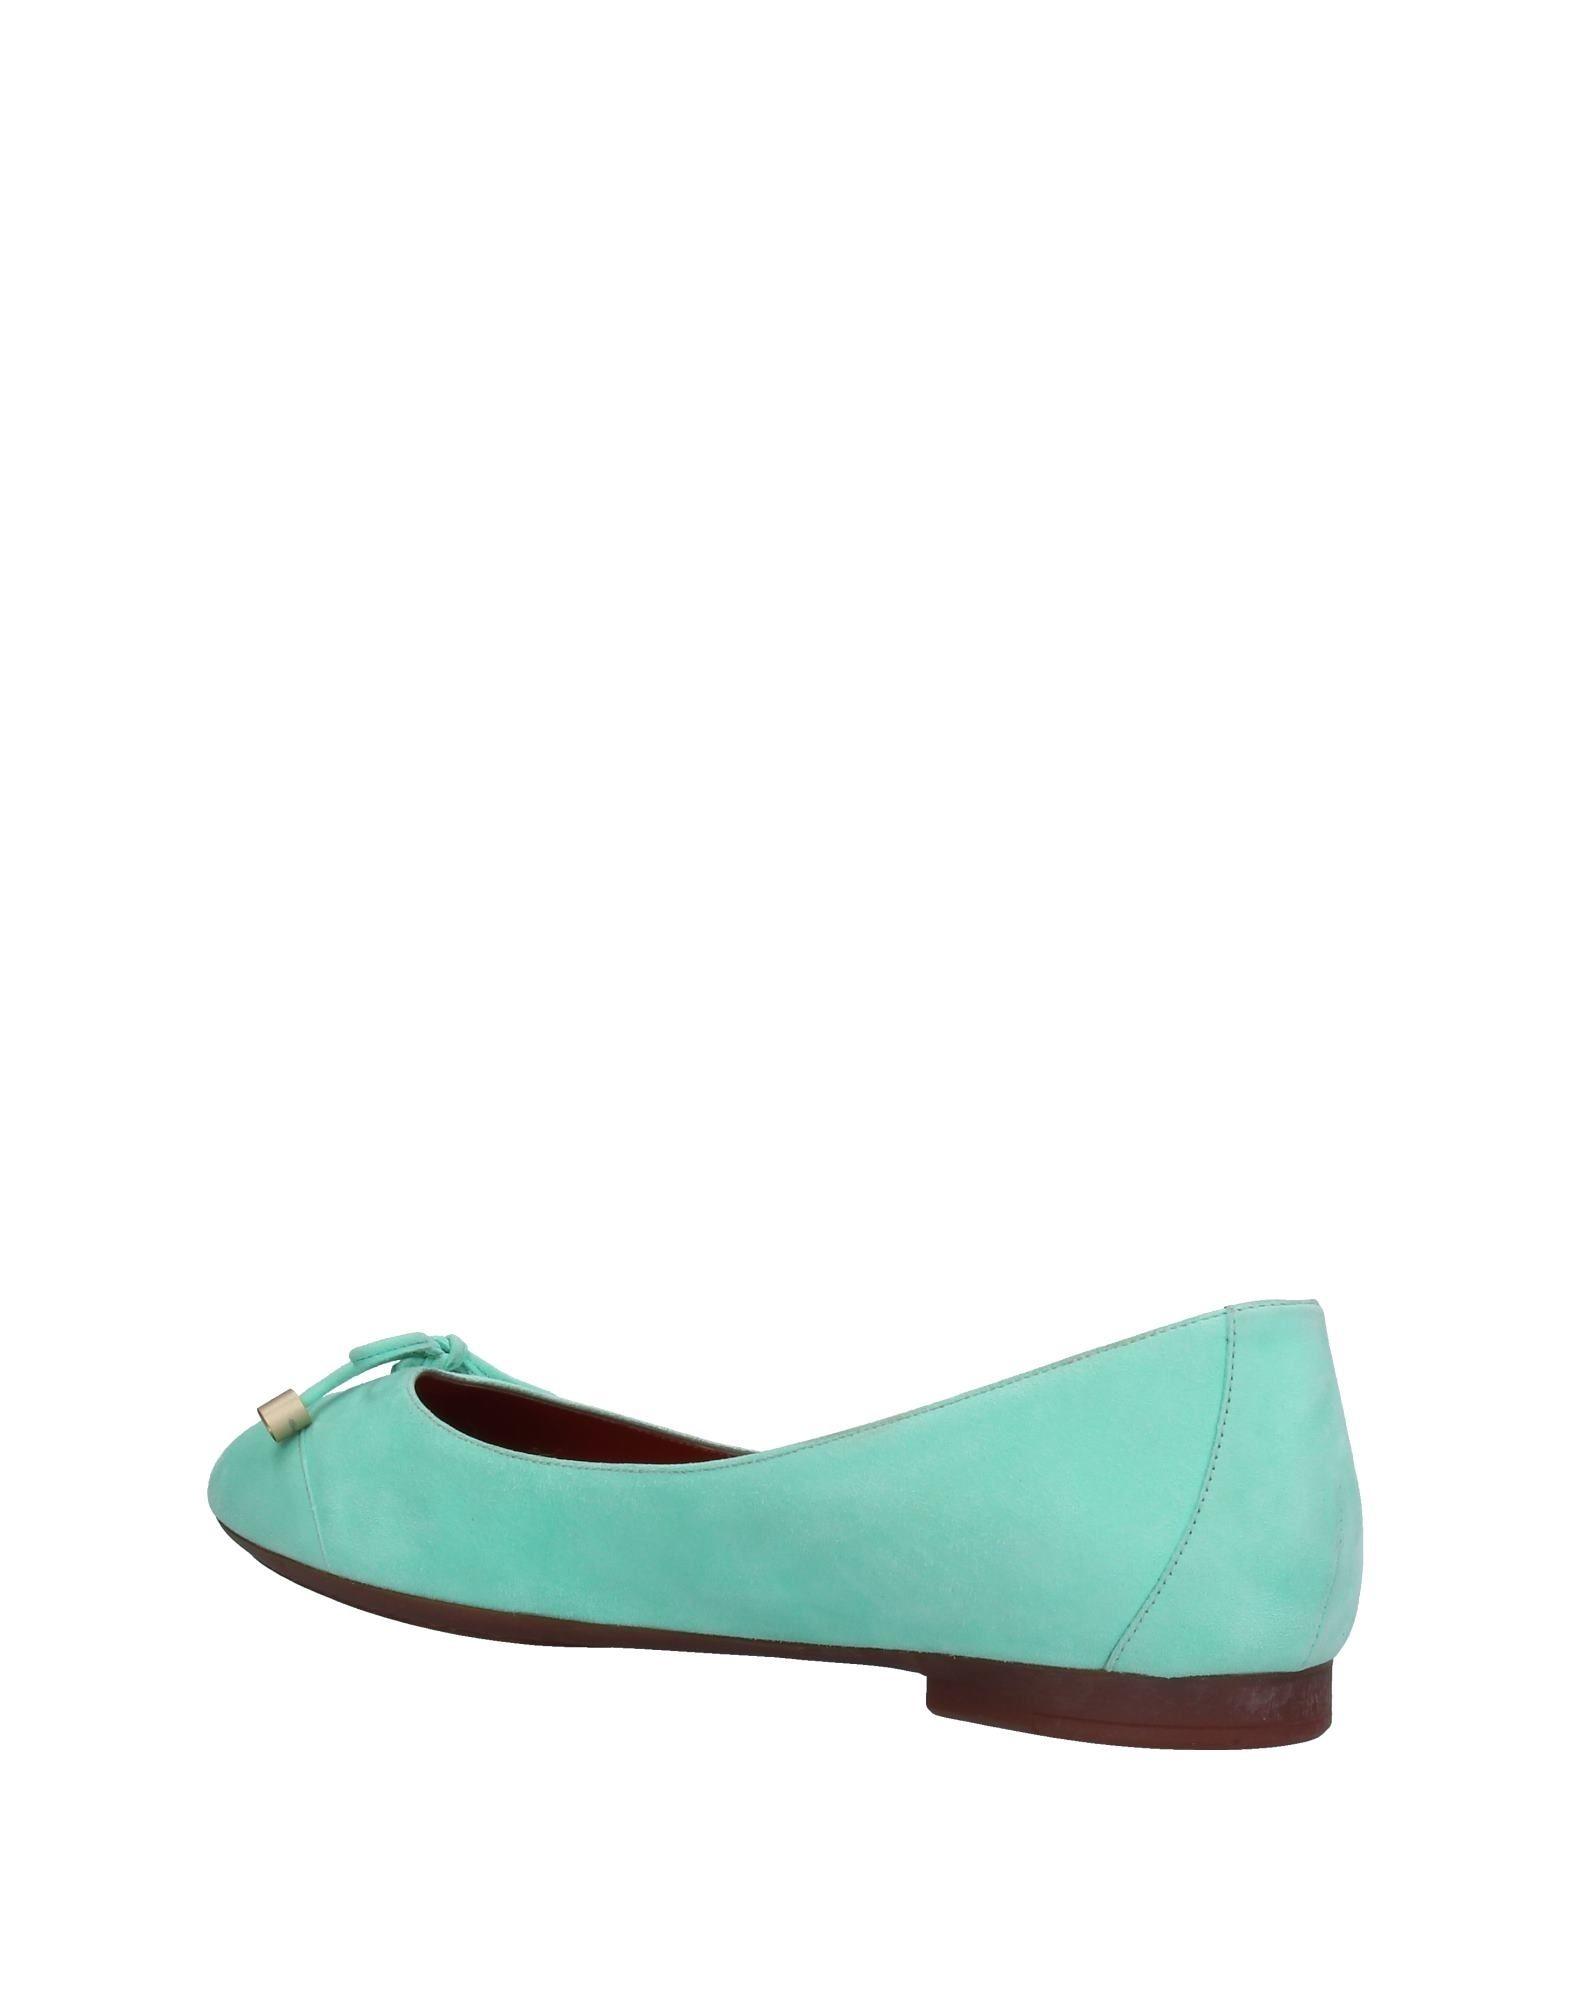 Stilvolle billige Schuhe Damen Santoni Ballerinas Damen Schuhe  11330406DI 3f400d